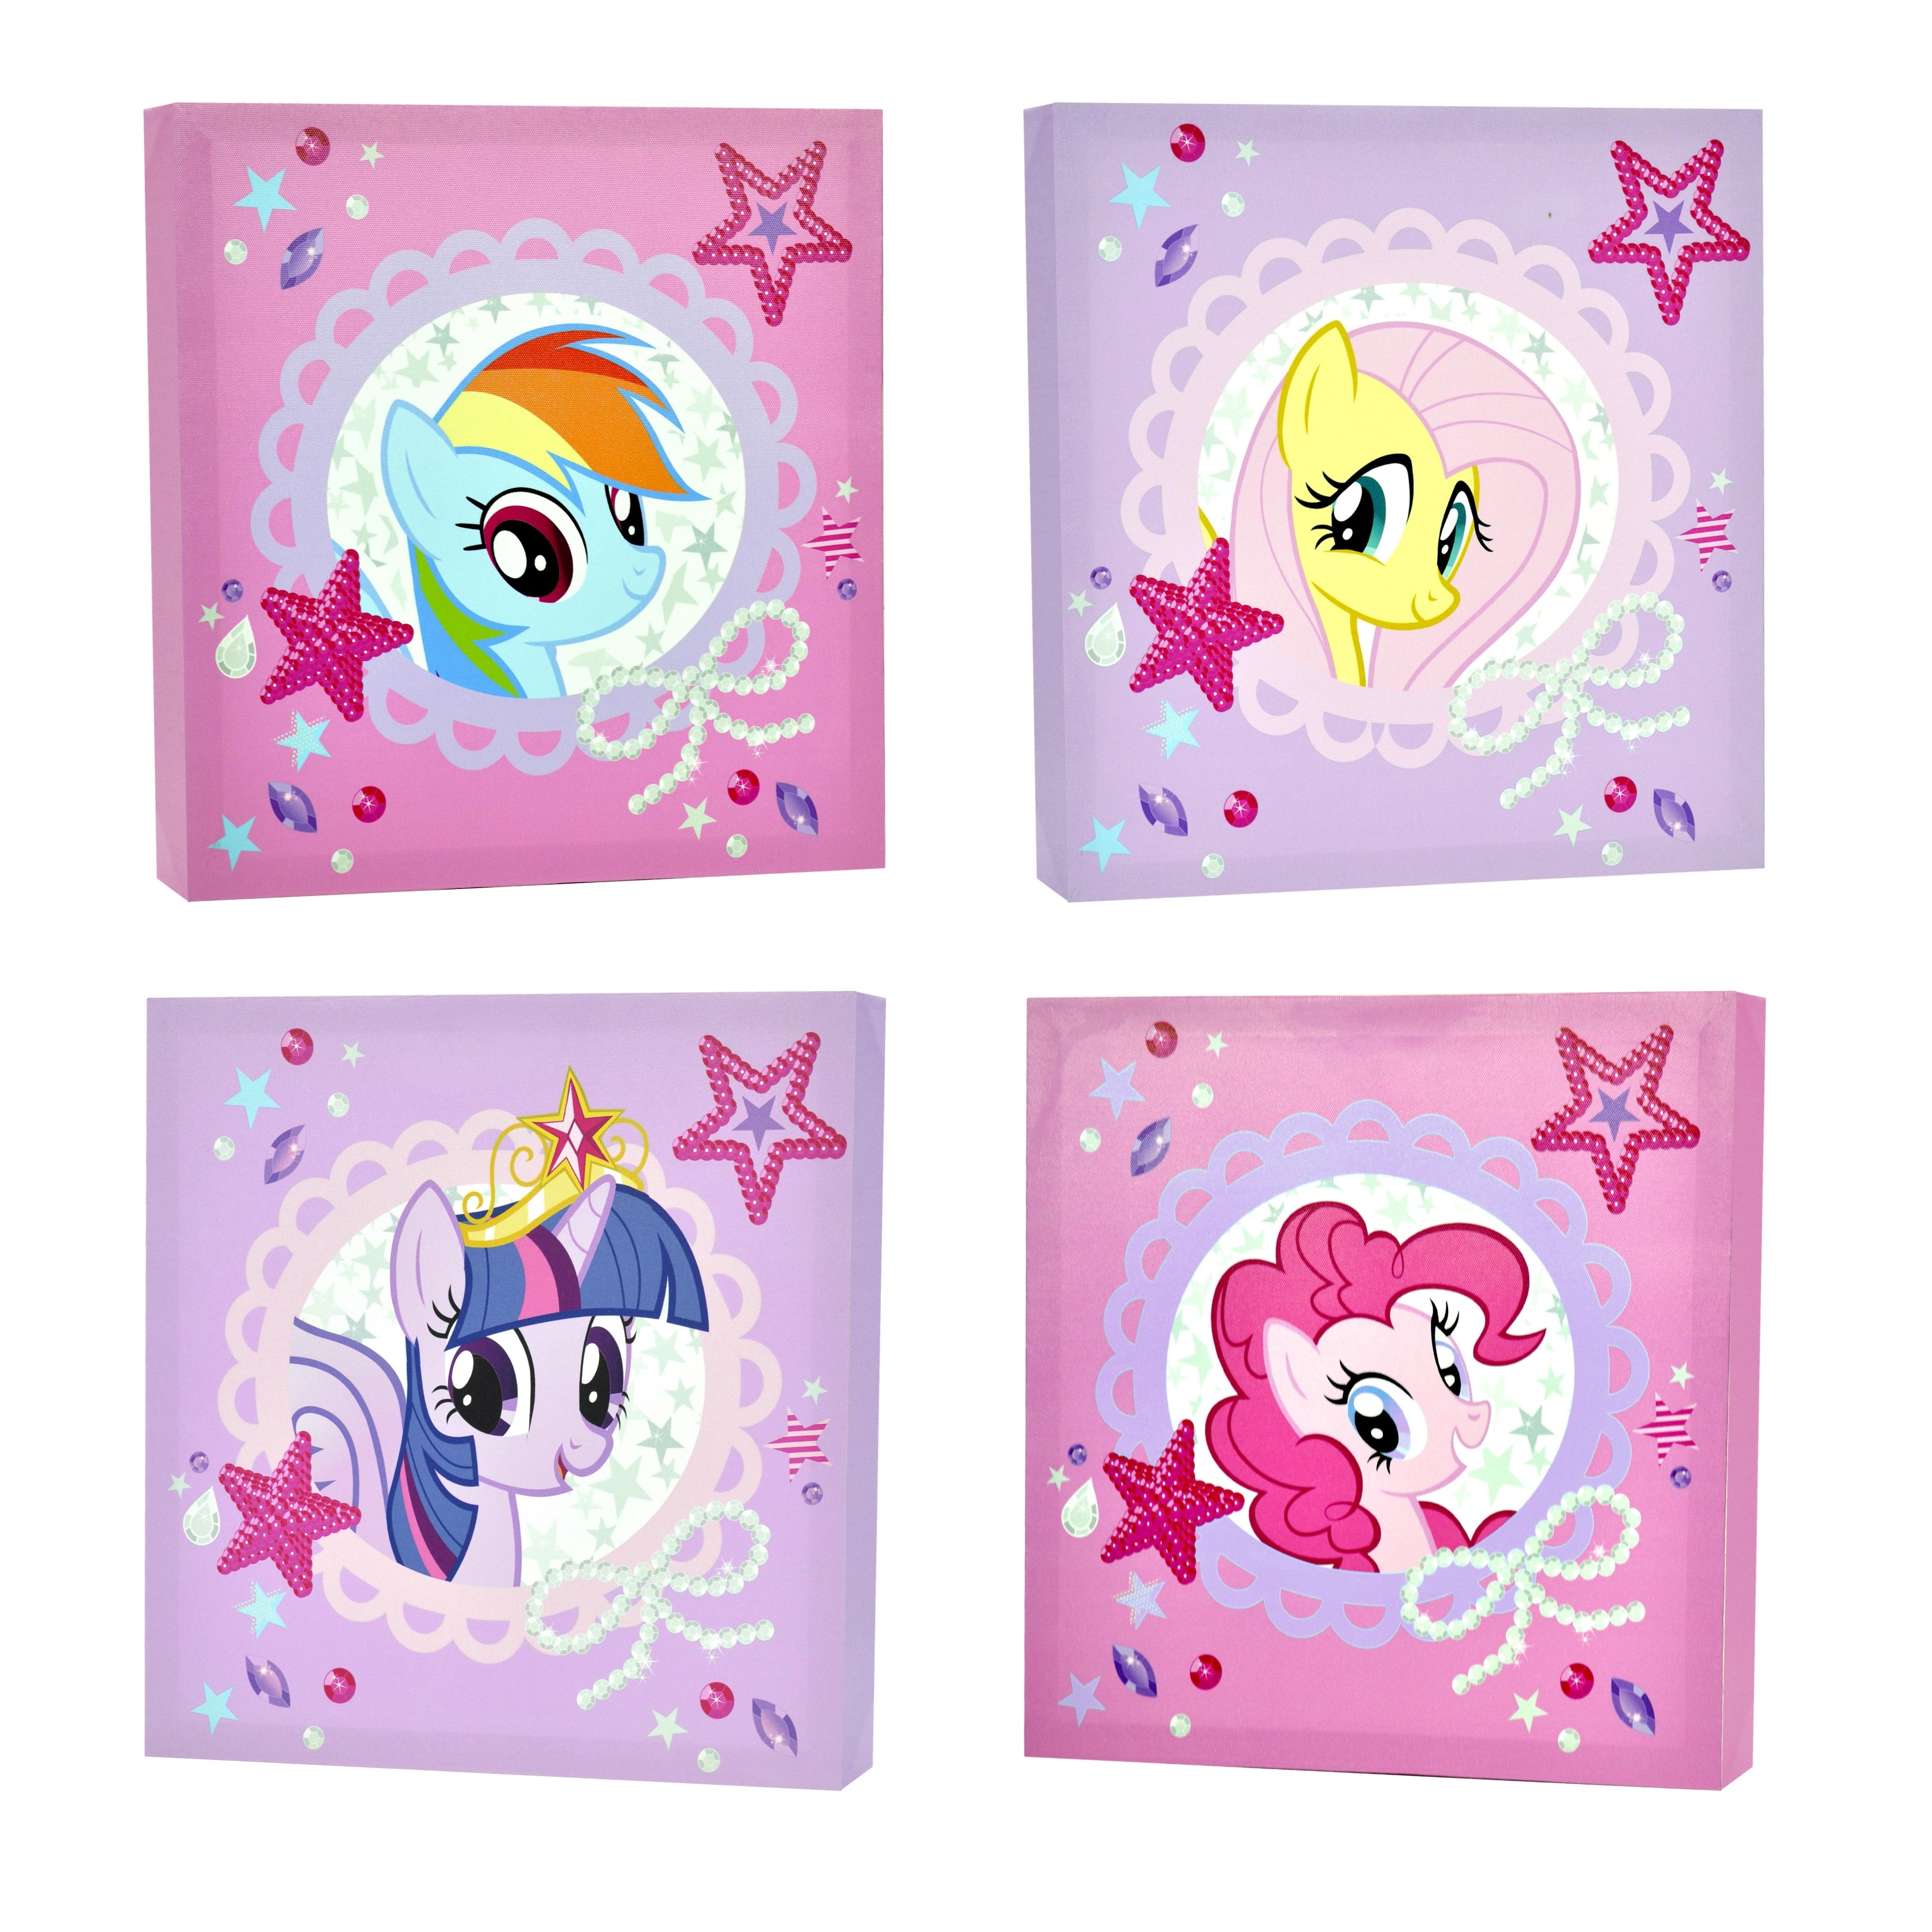 Newest My Little Pony 4 Piece Canvas Wall Art – Walmart Inside My Little Pony Wall Art (View 2 of 15)